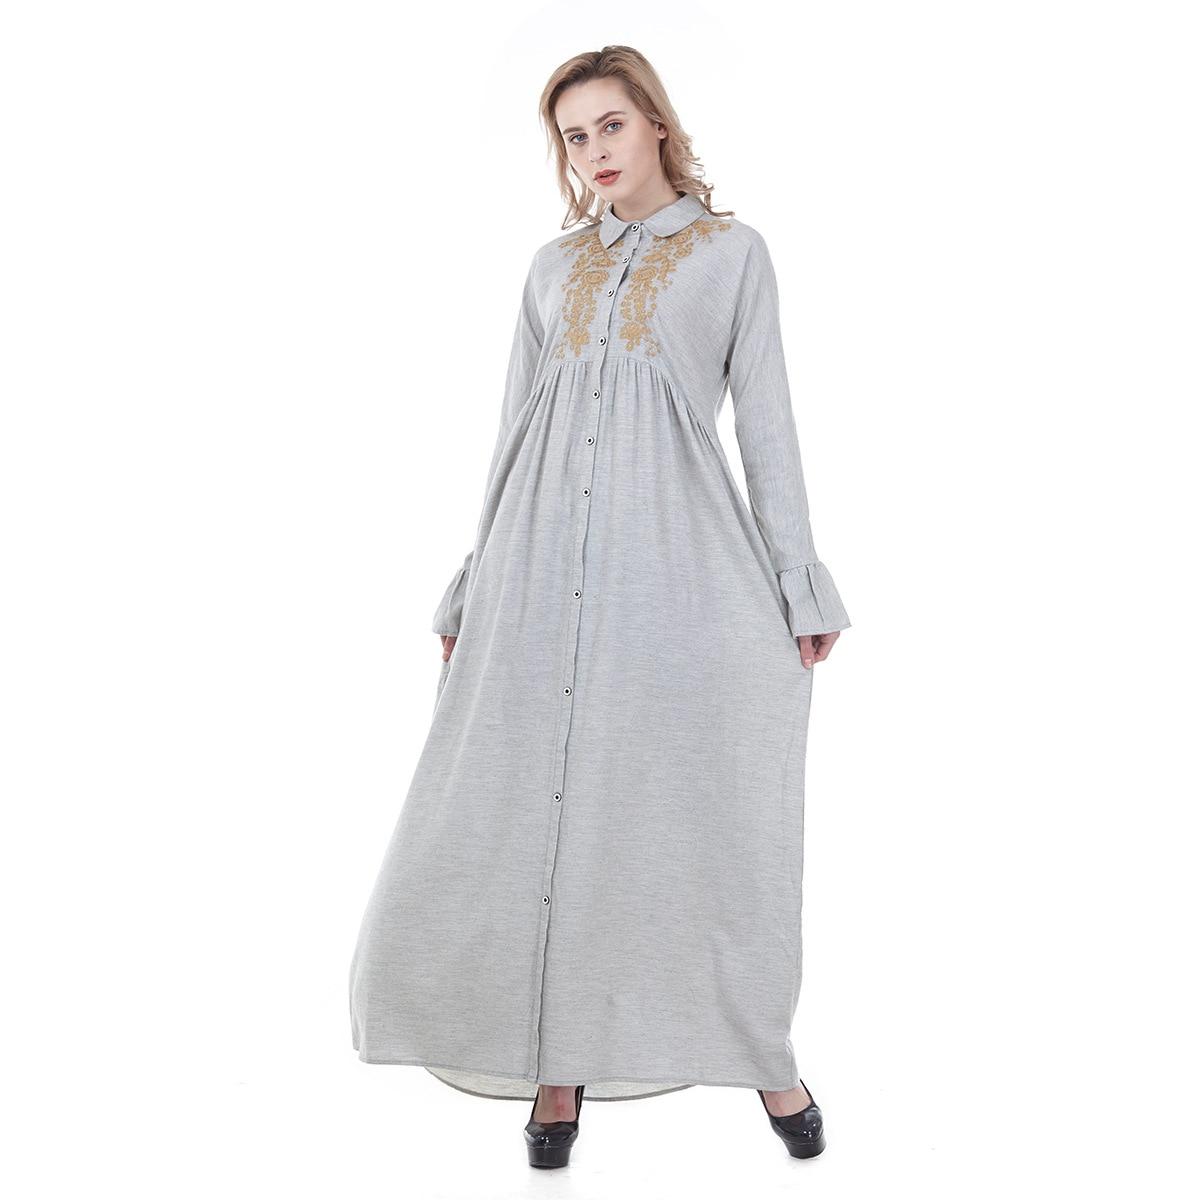 Middle East Fashionable Embroidered Sexy Shirt-style Cardigan Dress Muslim Clothing Kaftan Women Dubai Dress Turkey